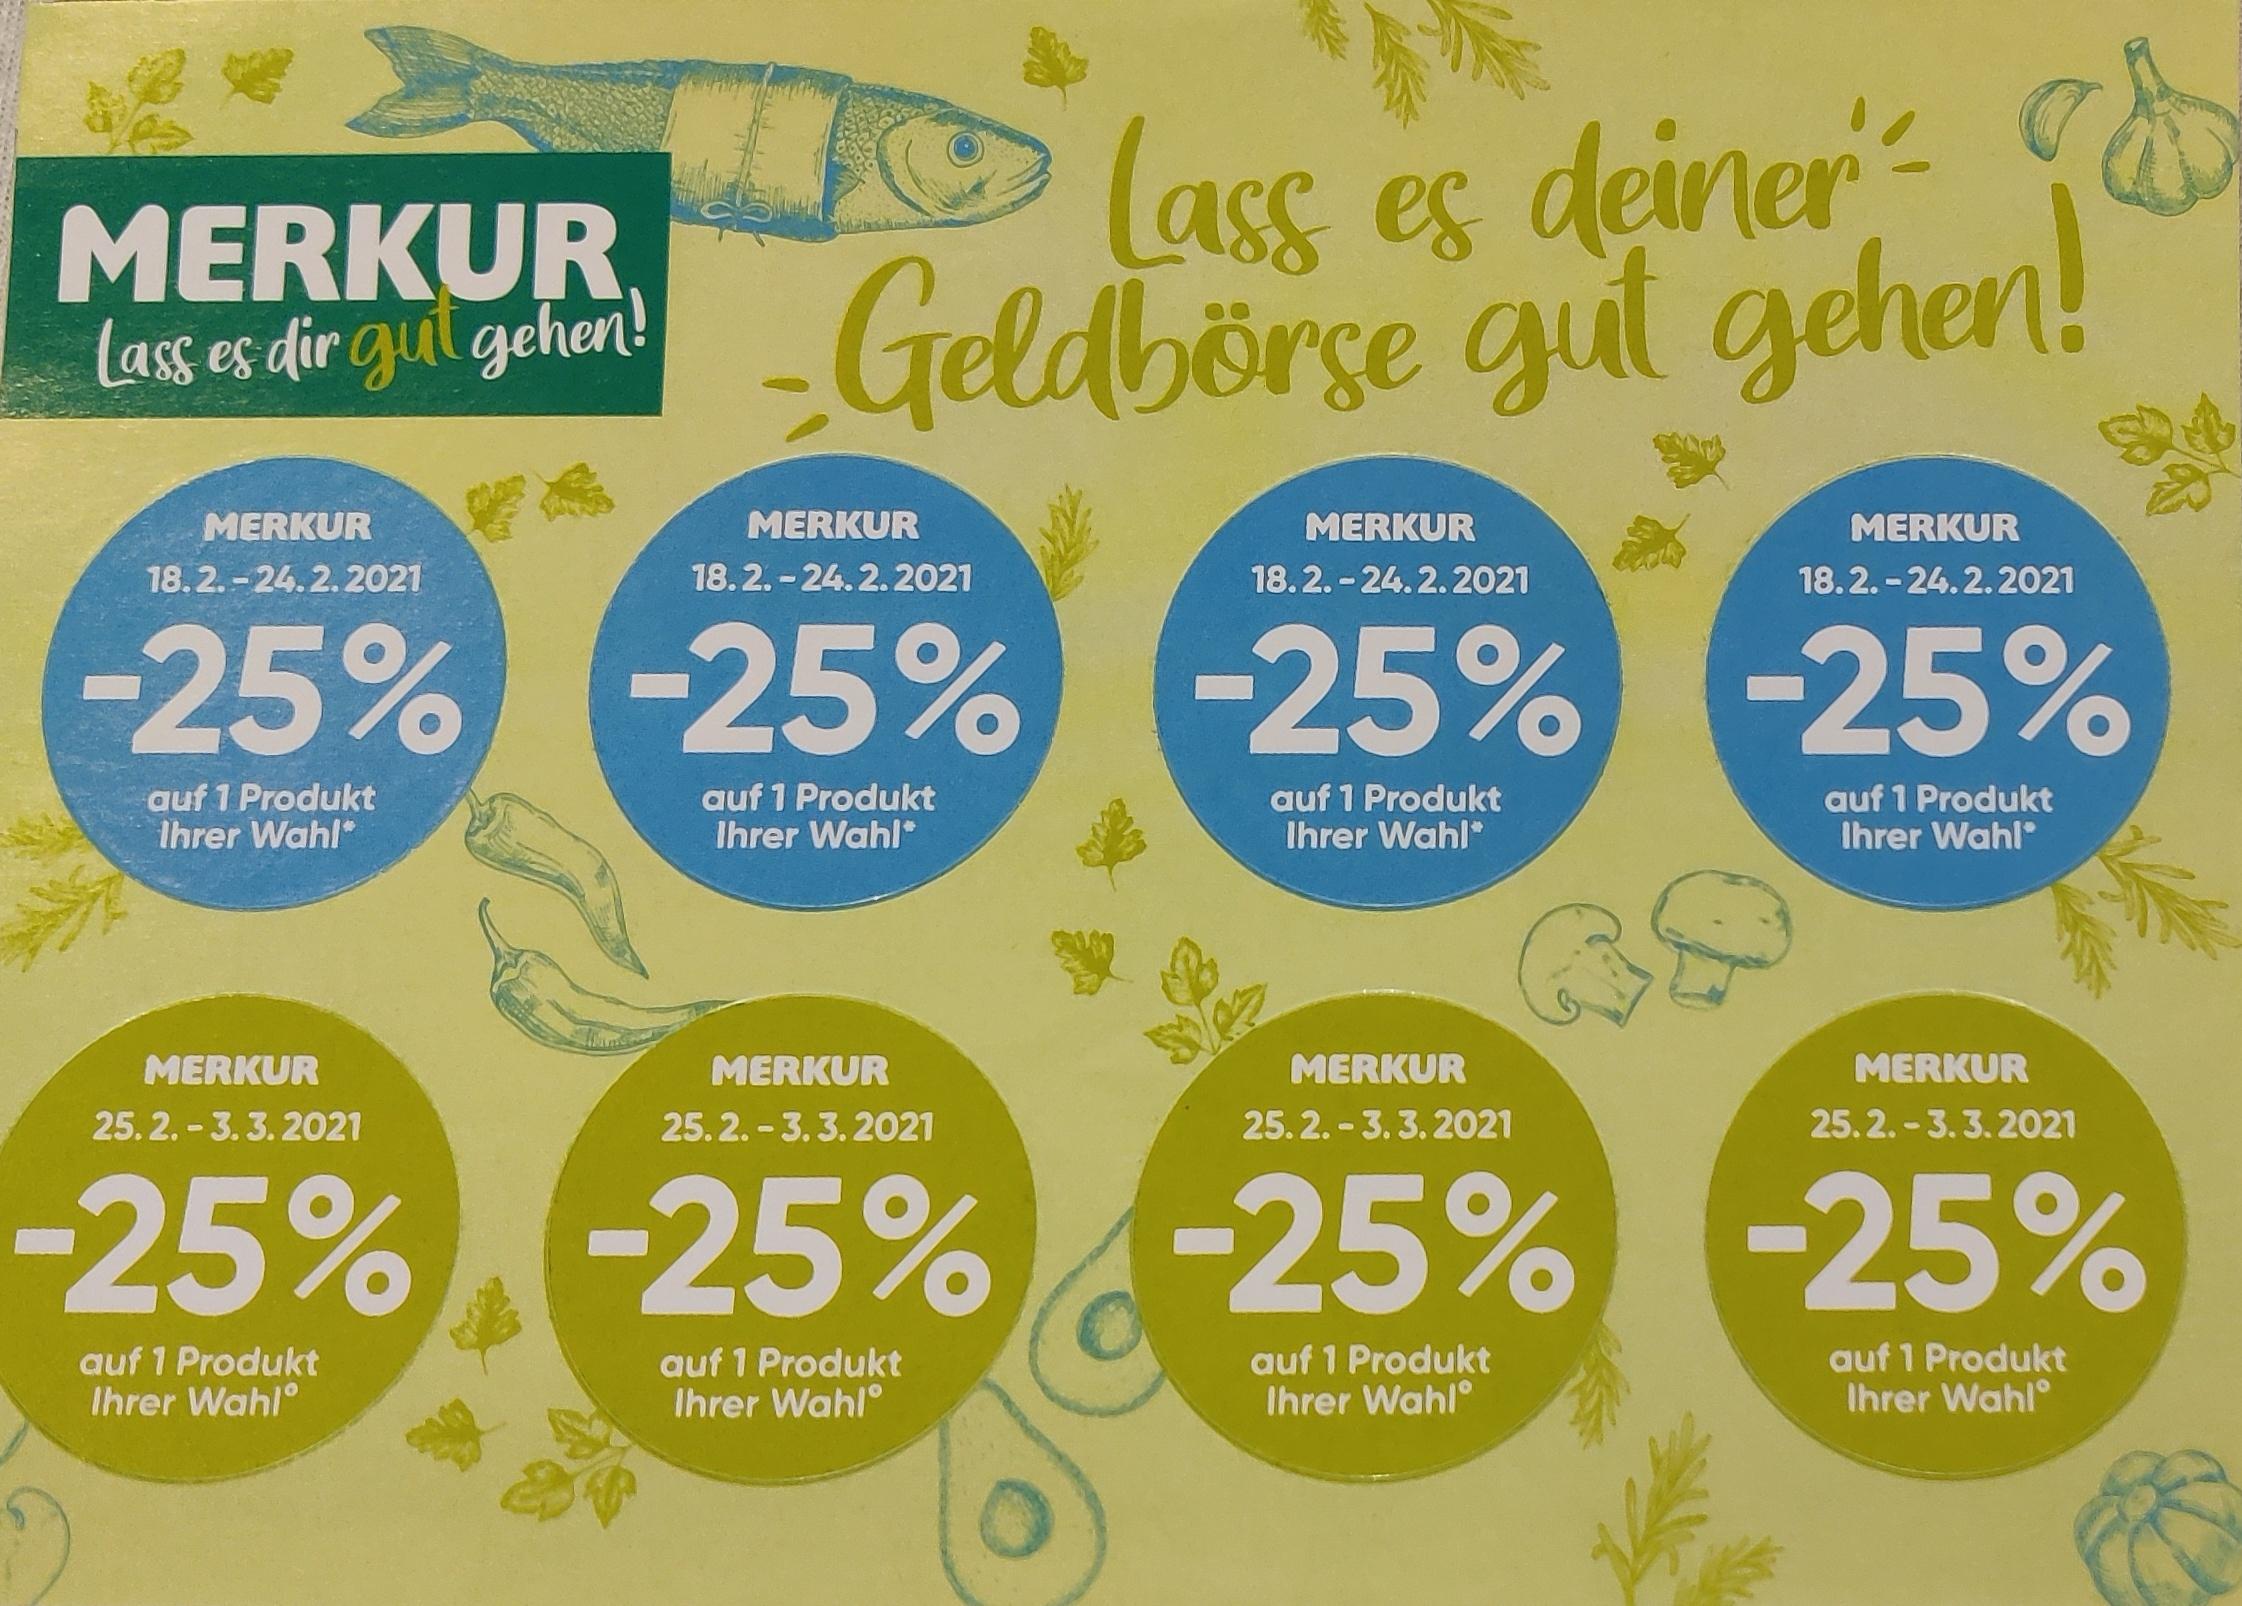 Merkur -25% Pickerl